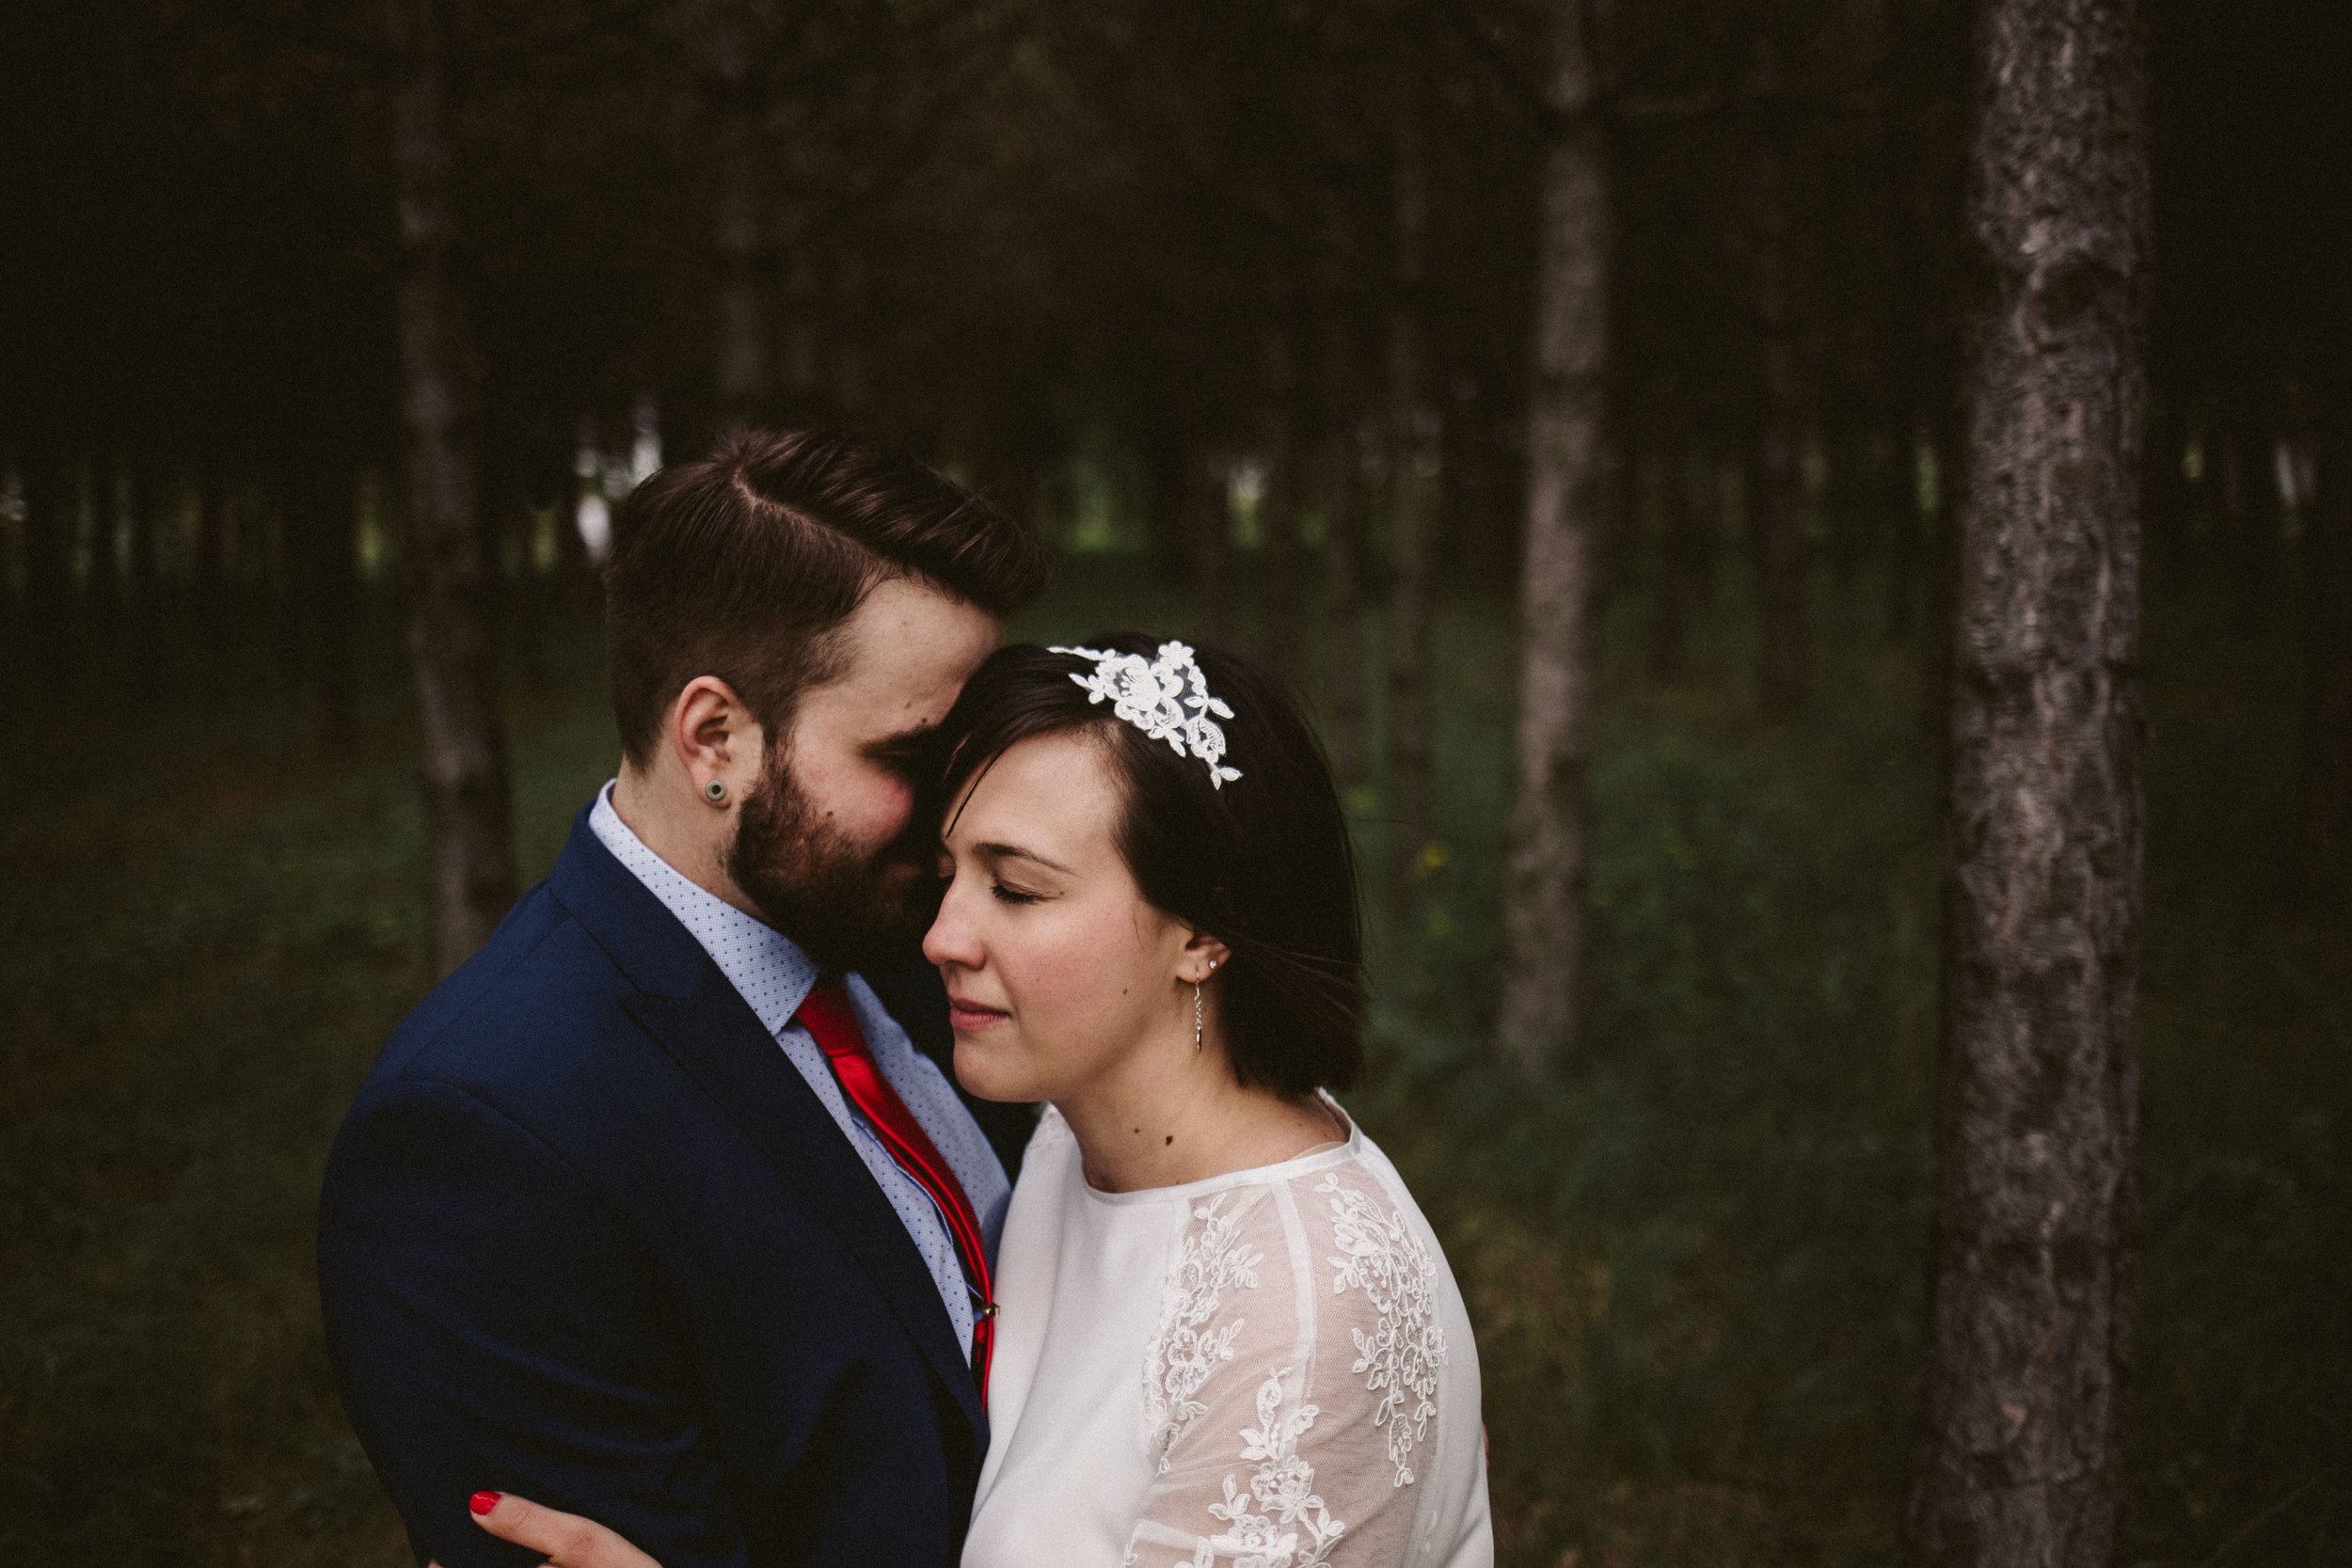 20170422_Szilvia+Pentti_wedding_w_066__MG_0028.jpg